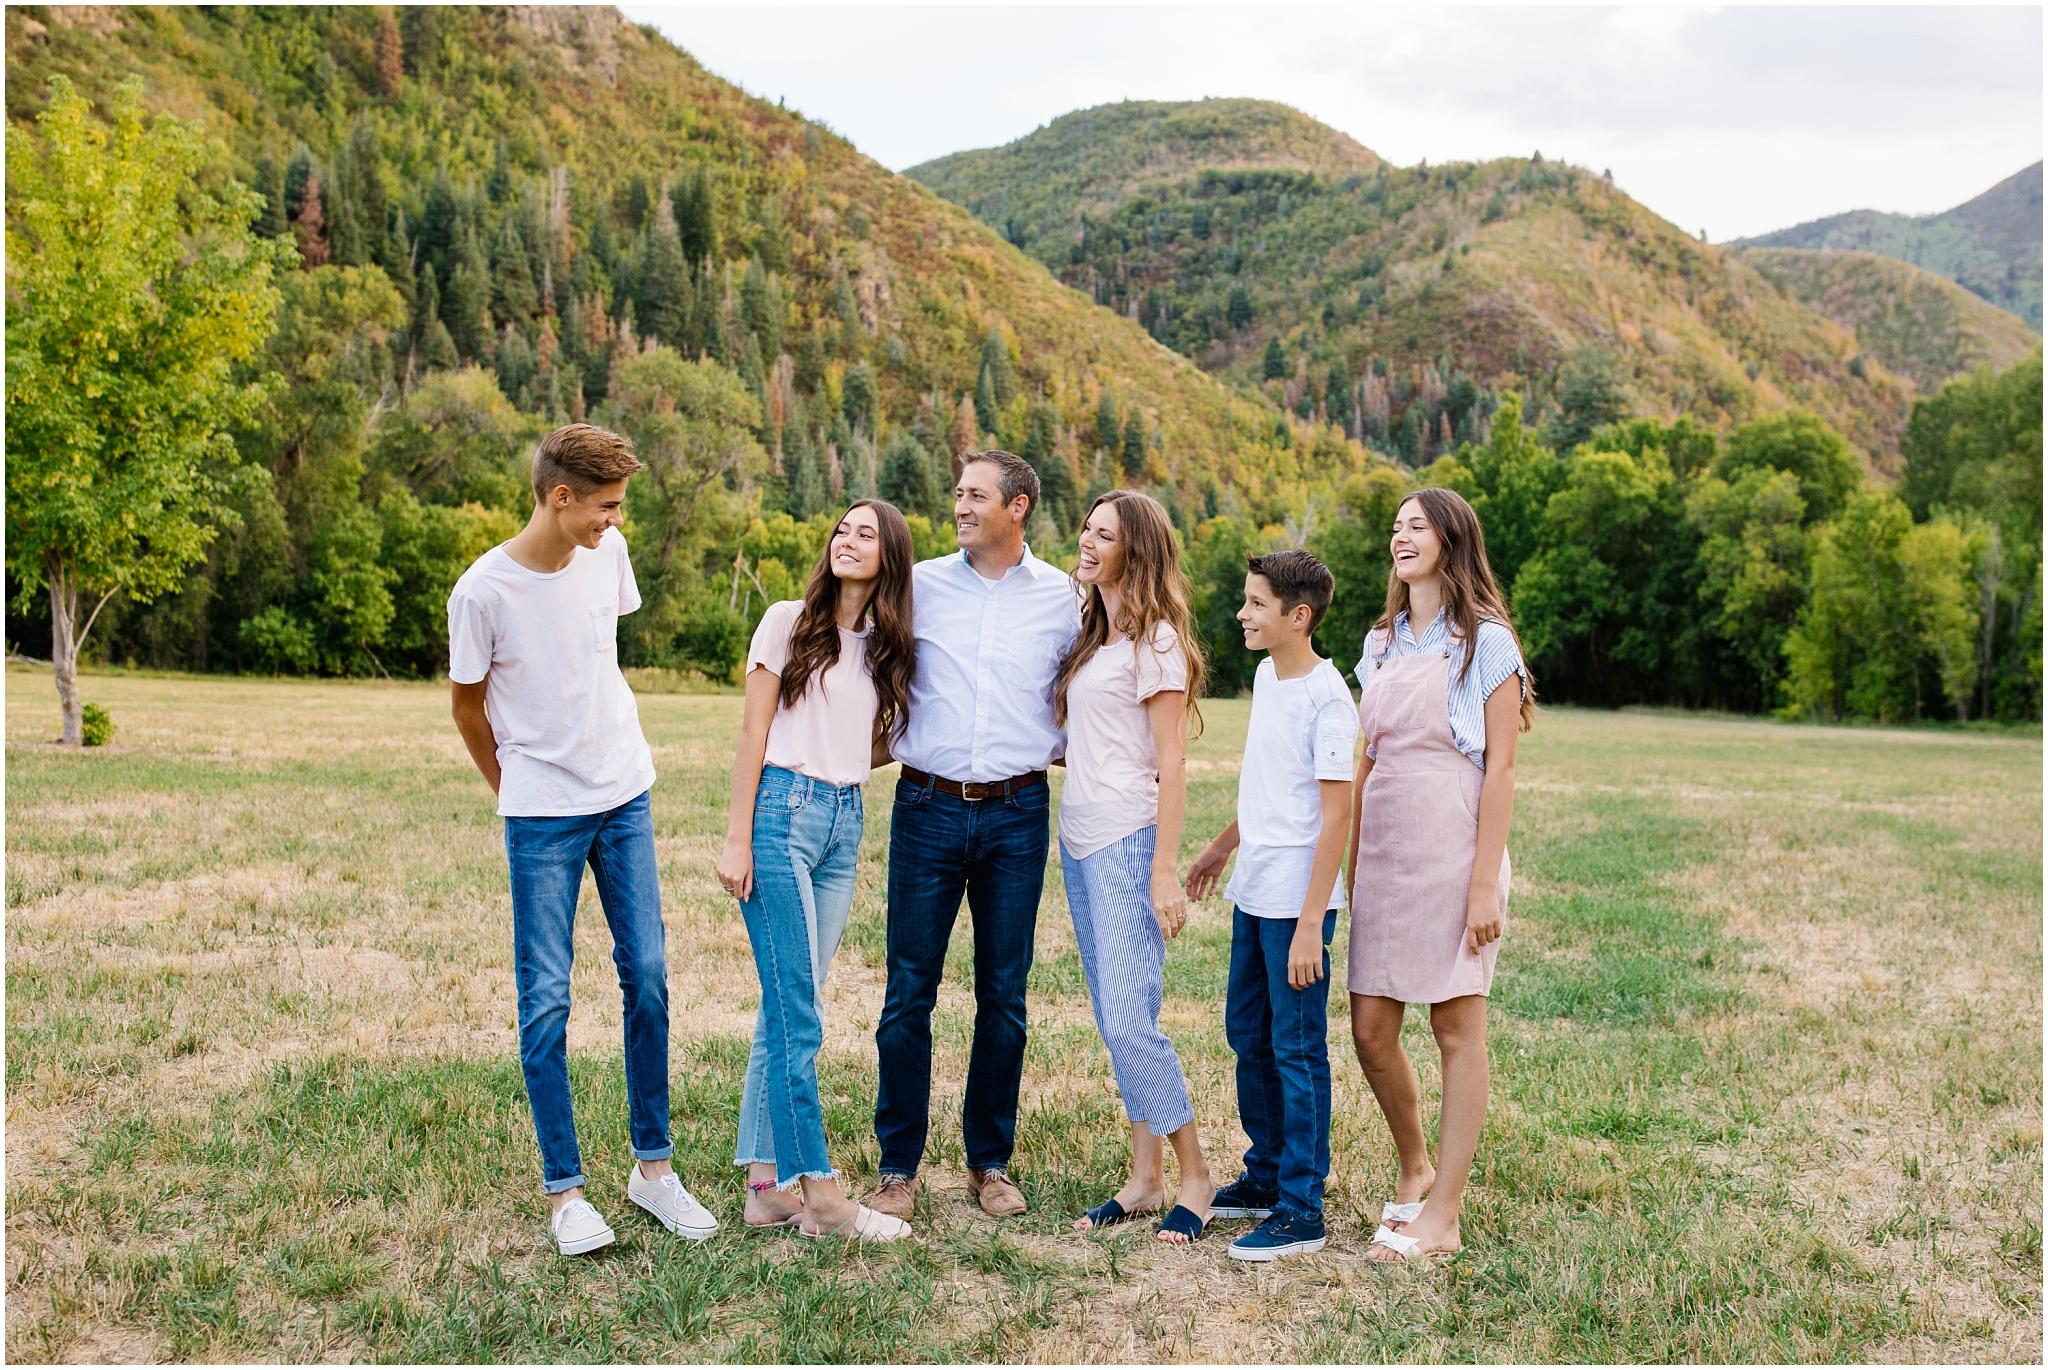 Overly-18_Lizzie-B-Imagery-Utah-Family-Photographer-Salt-Lake-City-Park-City-Utah-County-Hobble-Creek-Canyon-Jolleys-Ranch.jpg